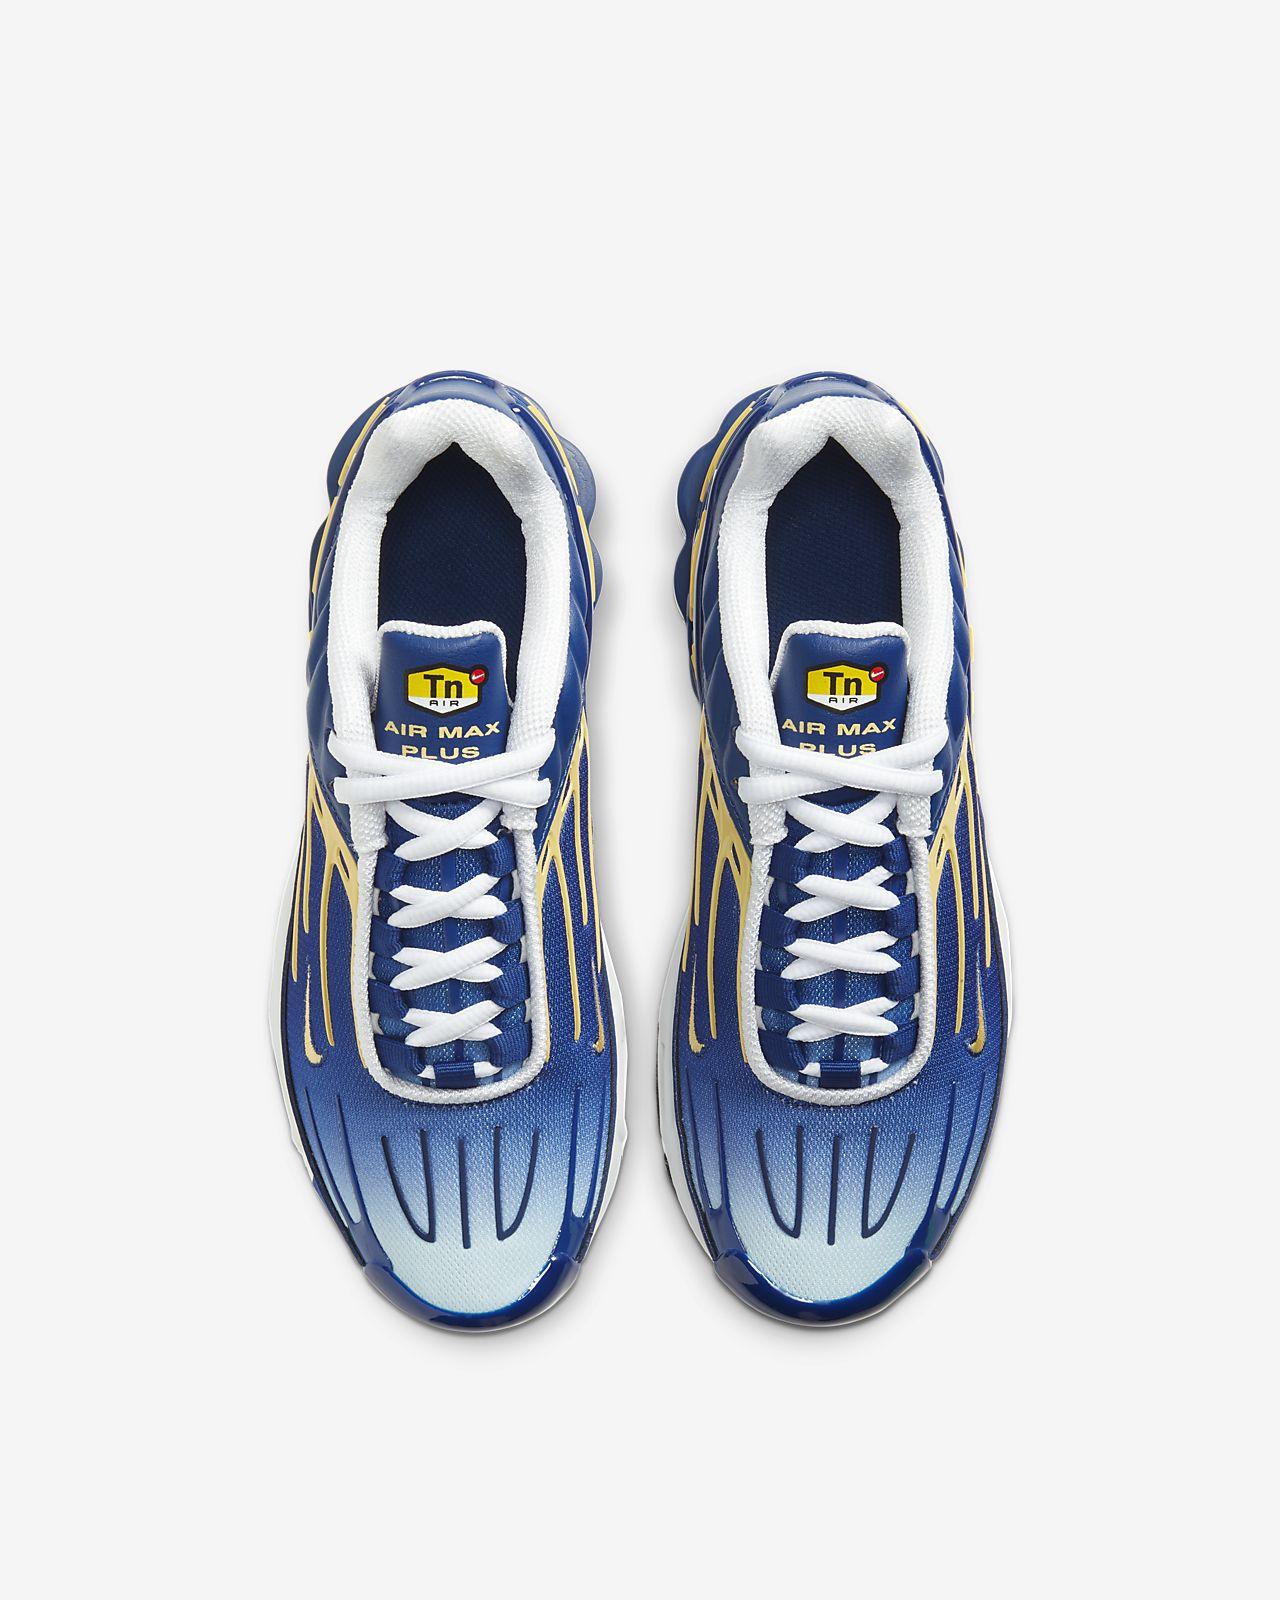 Nike Air Max 97 Sneakers Topaz GoldenBlackWhite